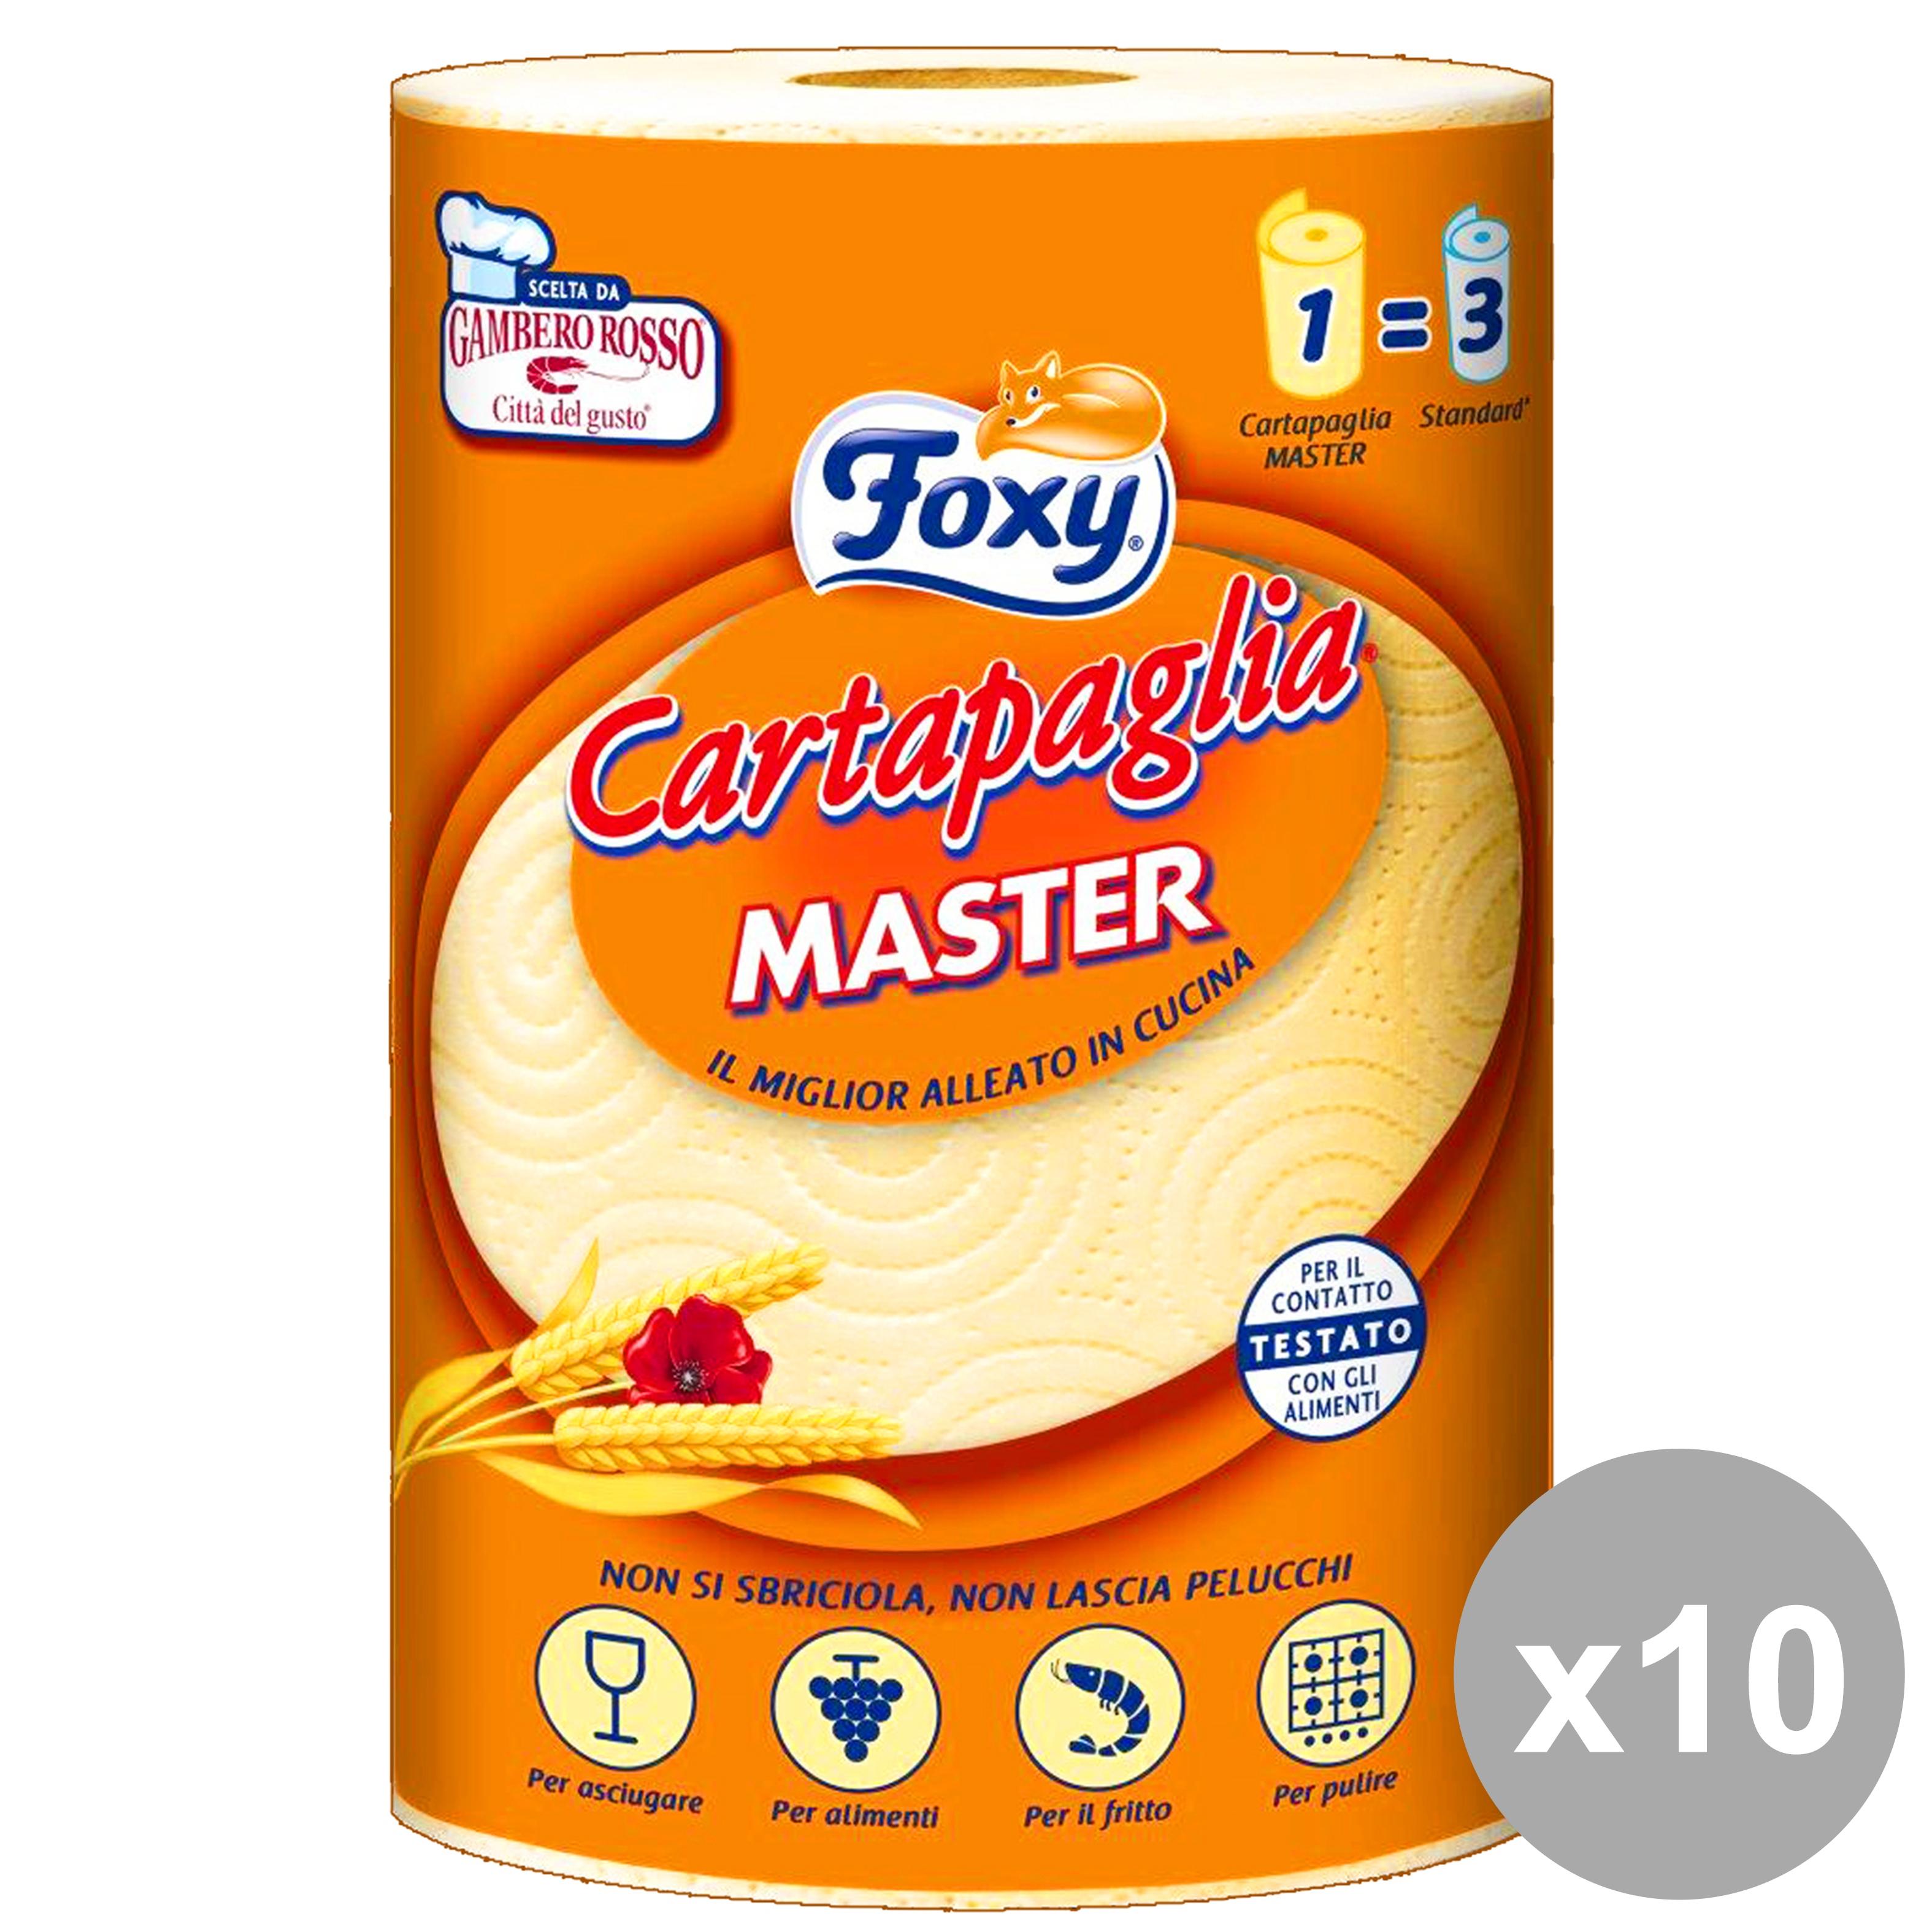 Acquista Set 10 X 1 Asciug Cartapaglia 17533707 | Glooke.com